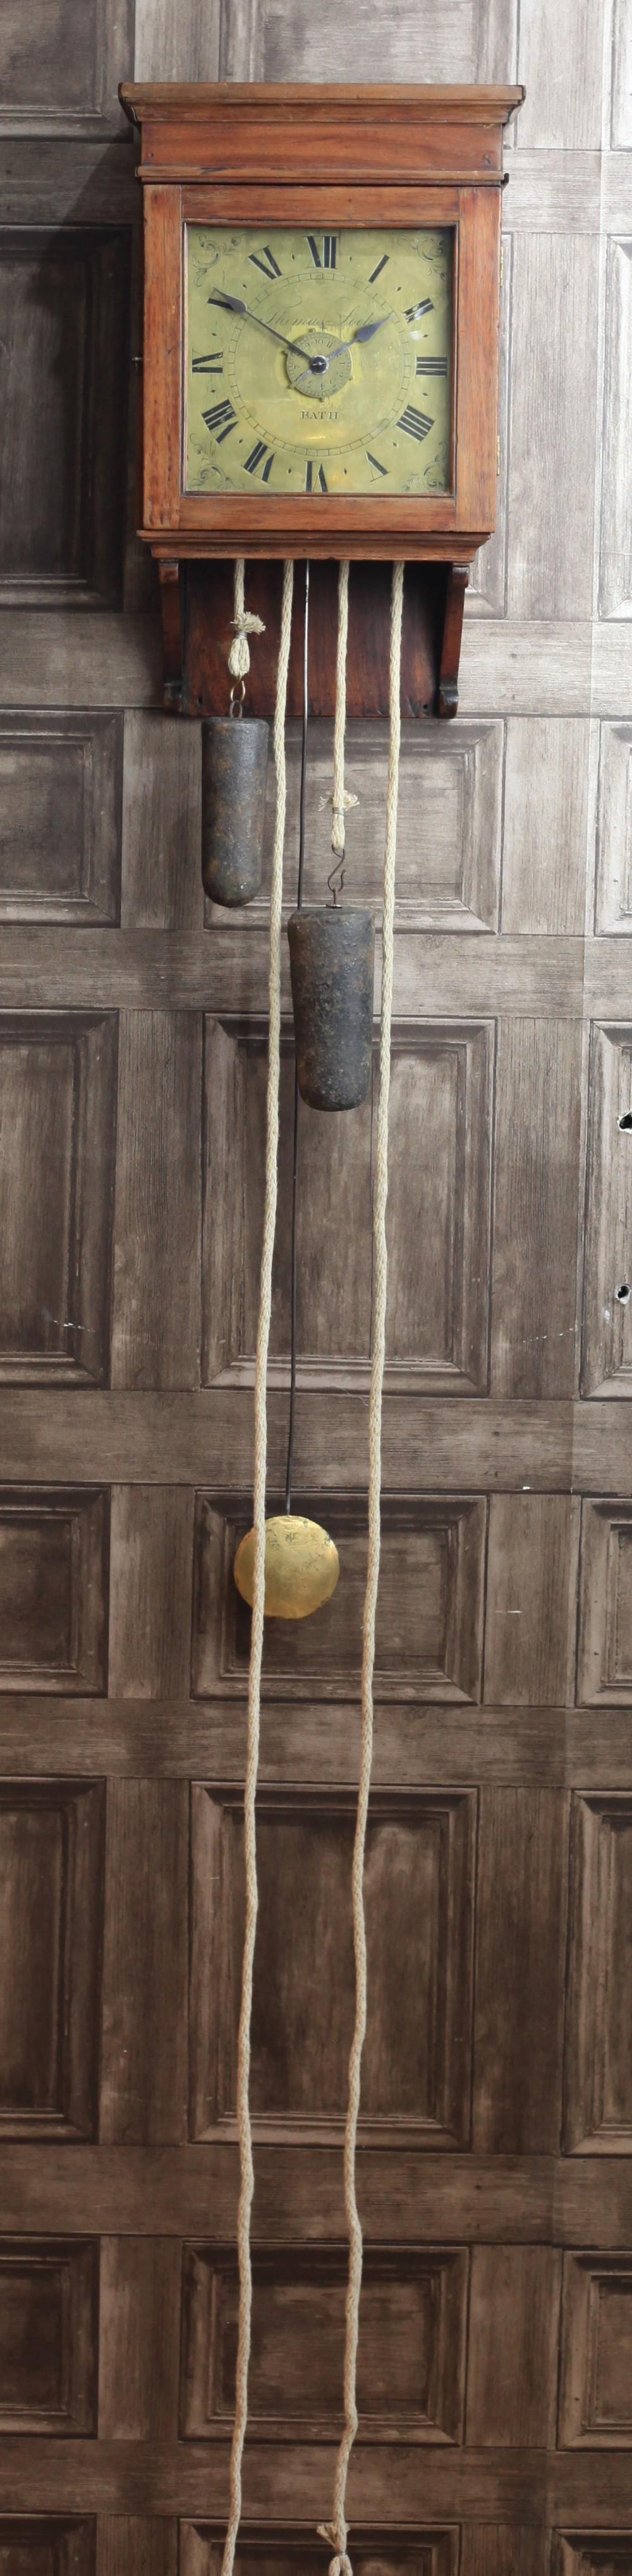 a rare george ii hooded wall clock by thomas lock c1750